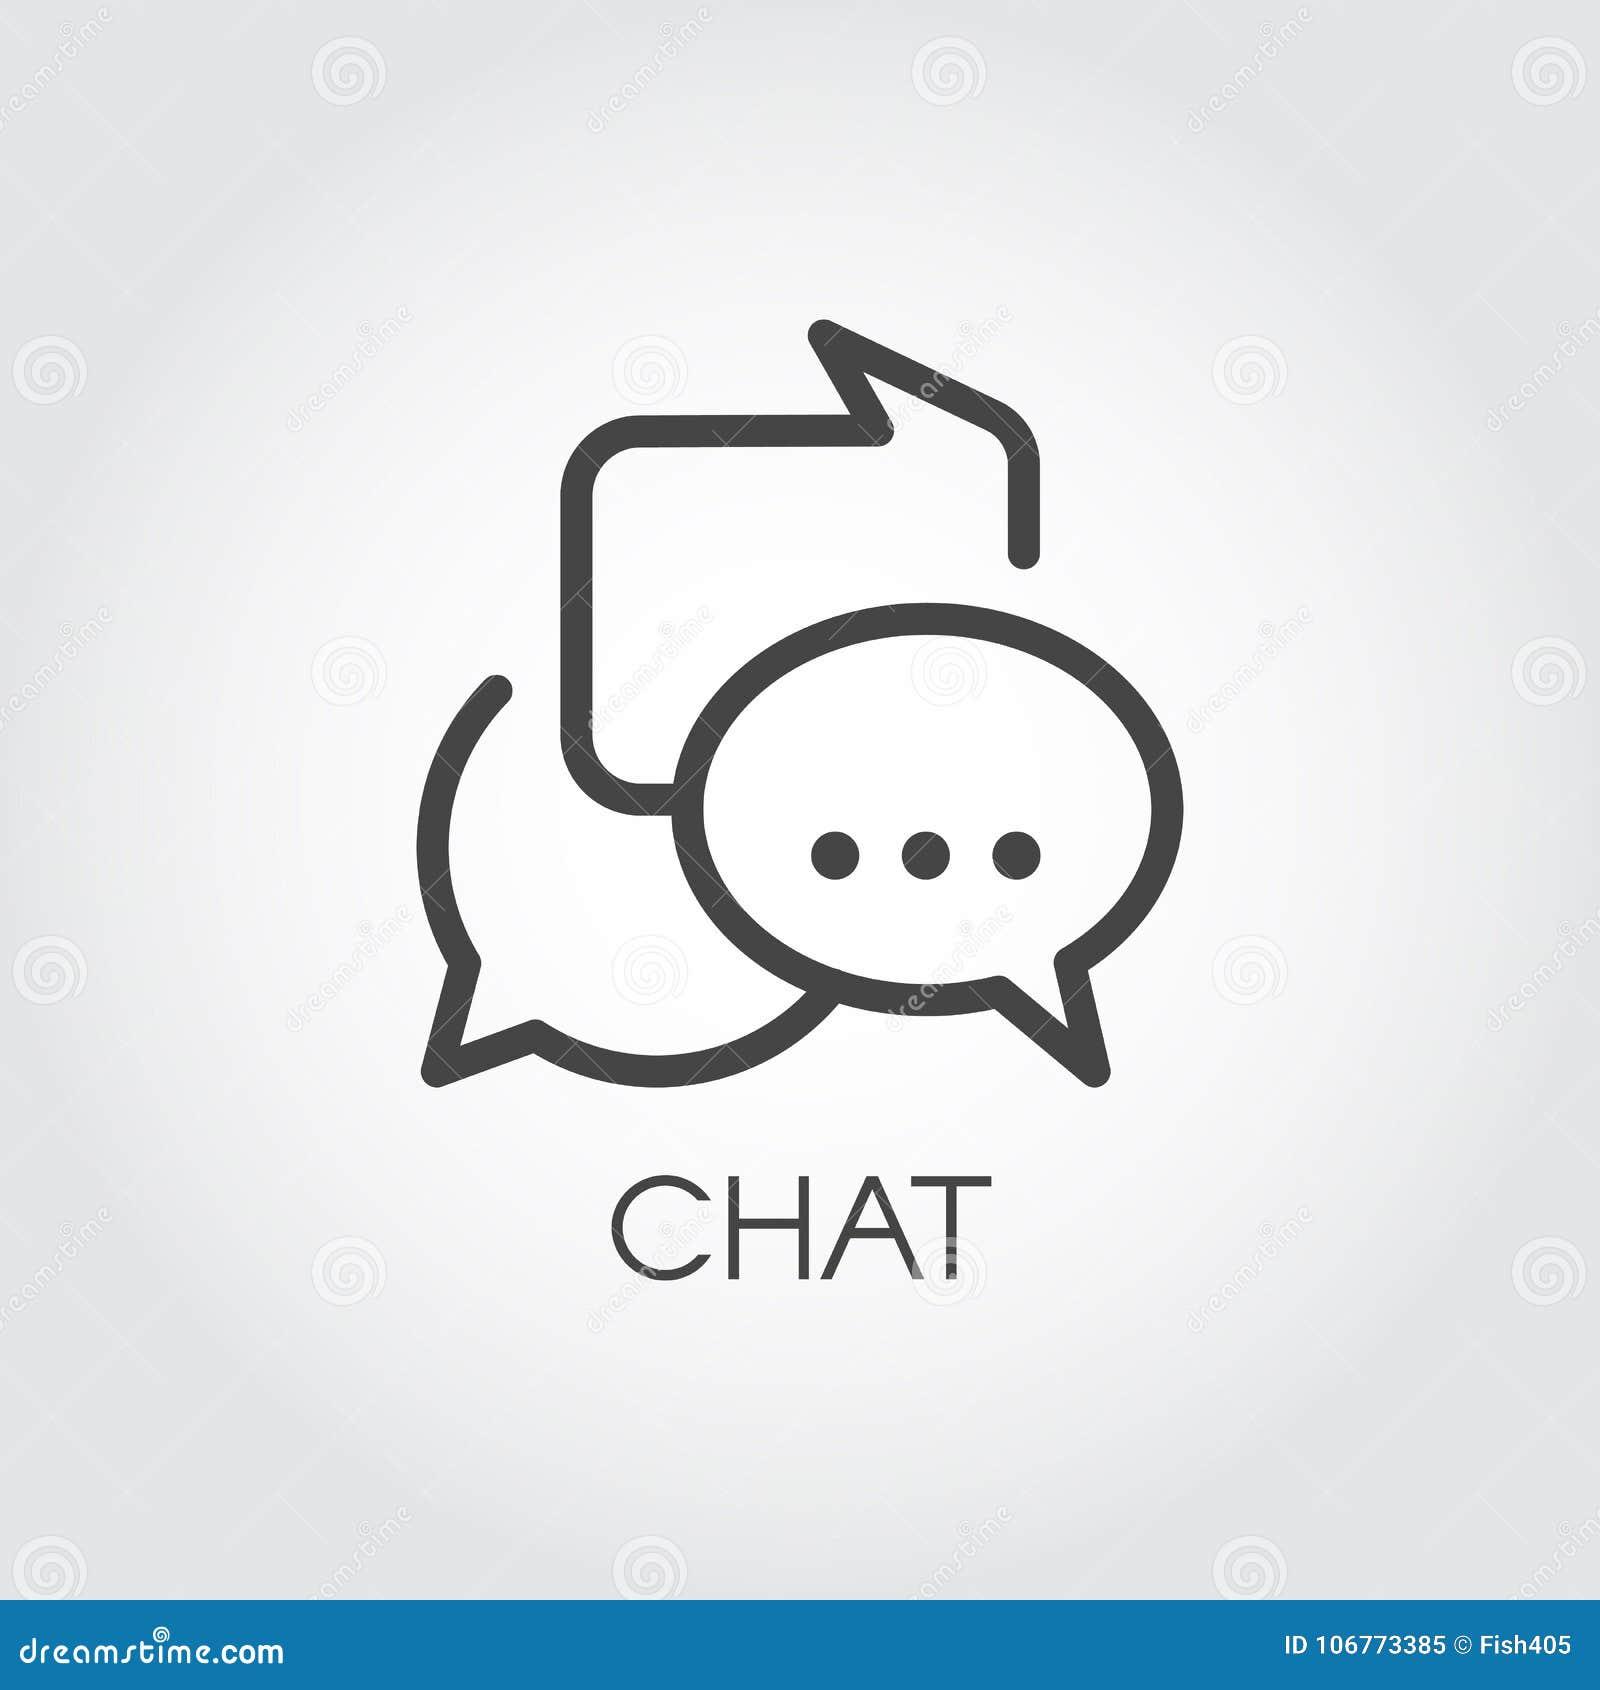 Chatting icon in outline style. Dialog speech contour bubbles. Messages or conversation line pictograph. UI element